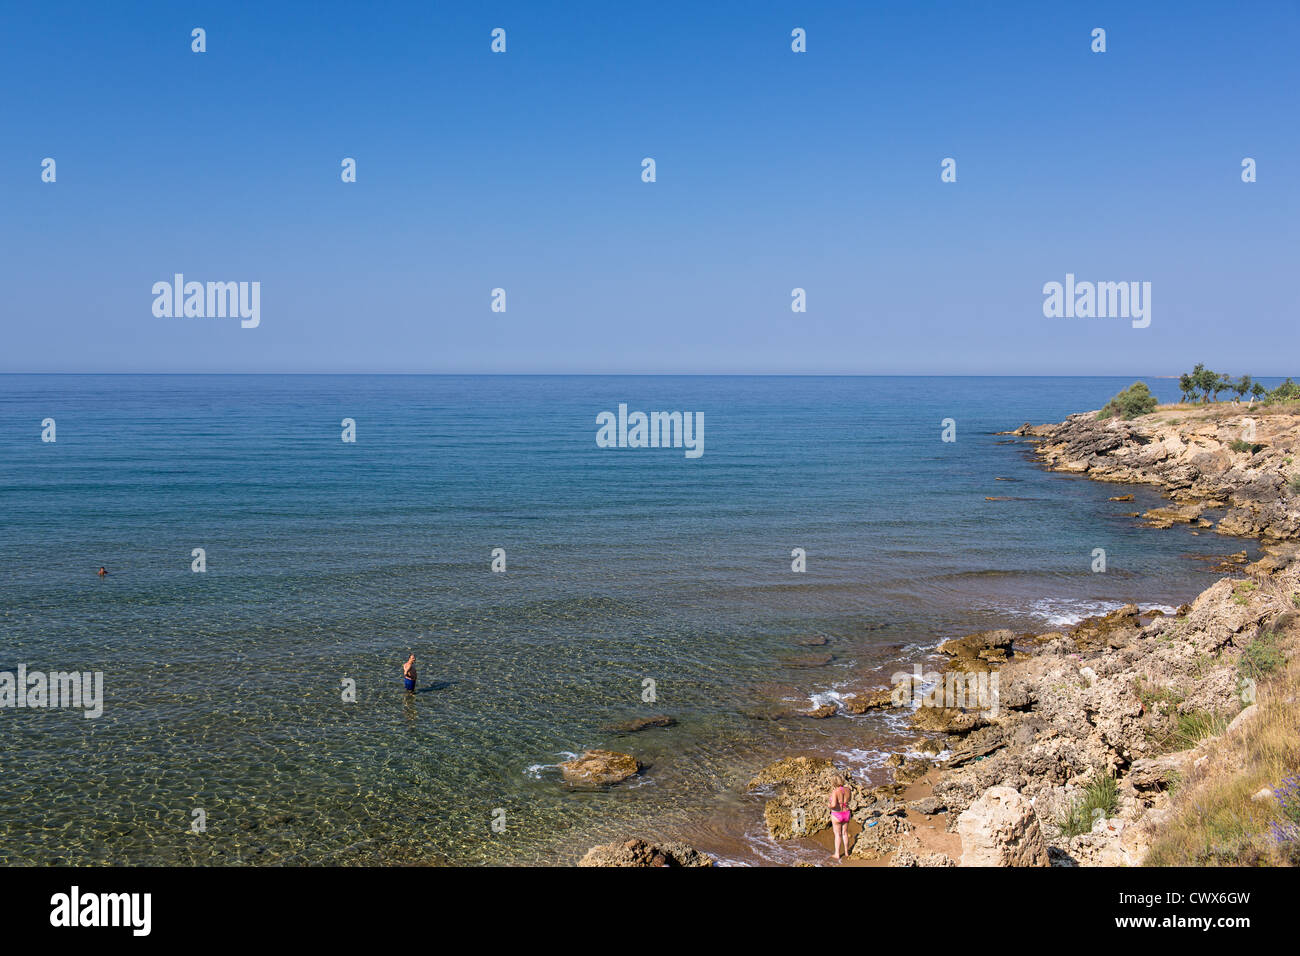 Tourists on an untamed coast in Agios Georgios, Corfu, Ionian Islands, Greece. - Stock Image